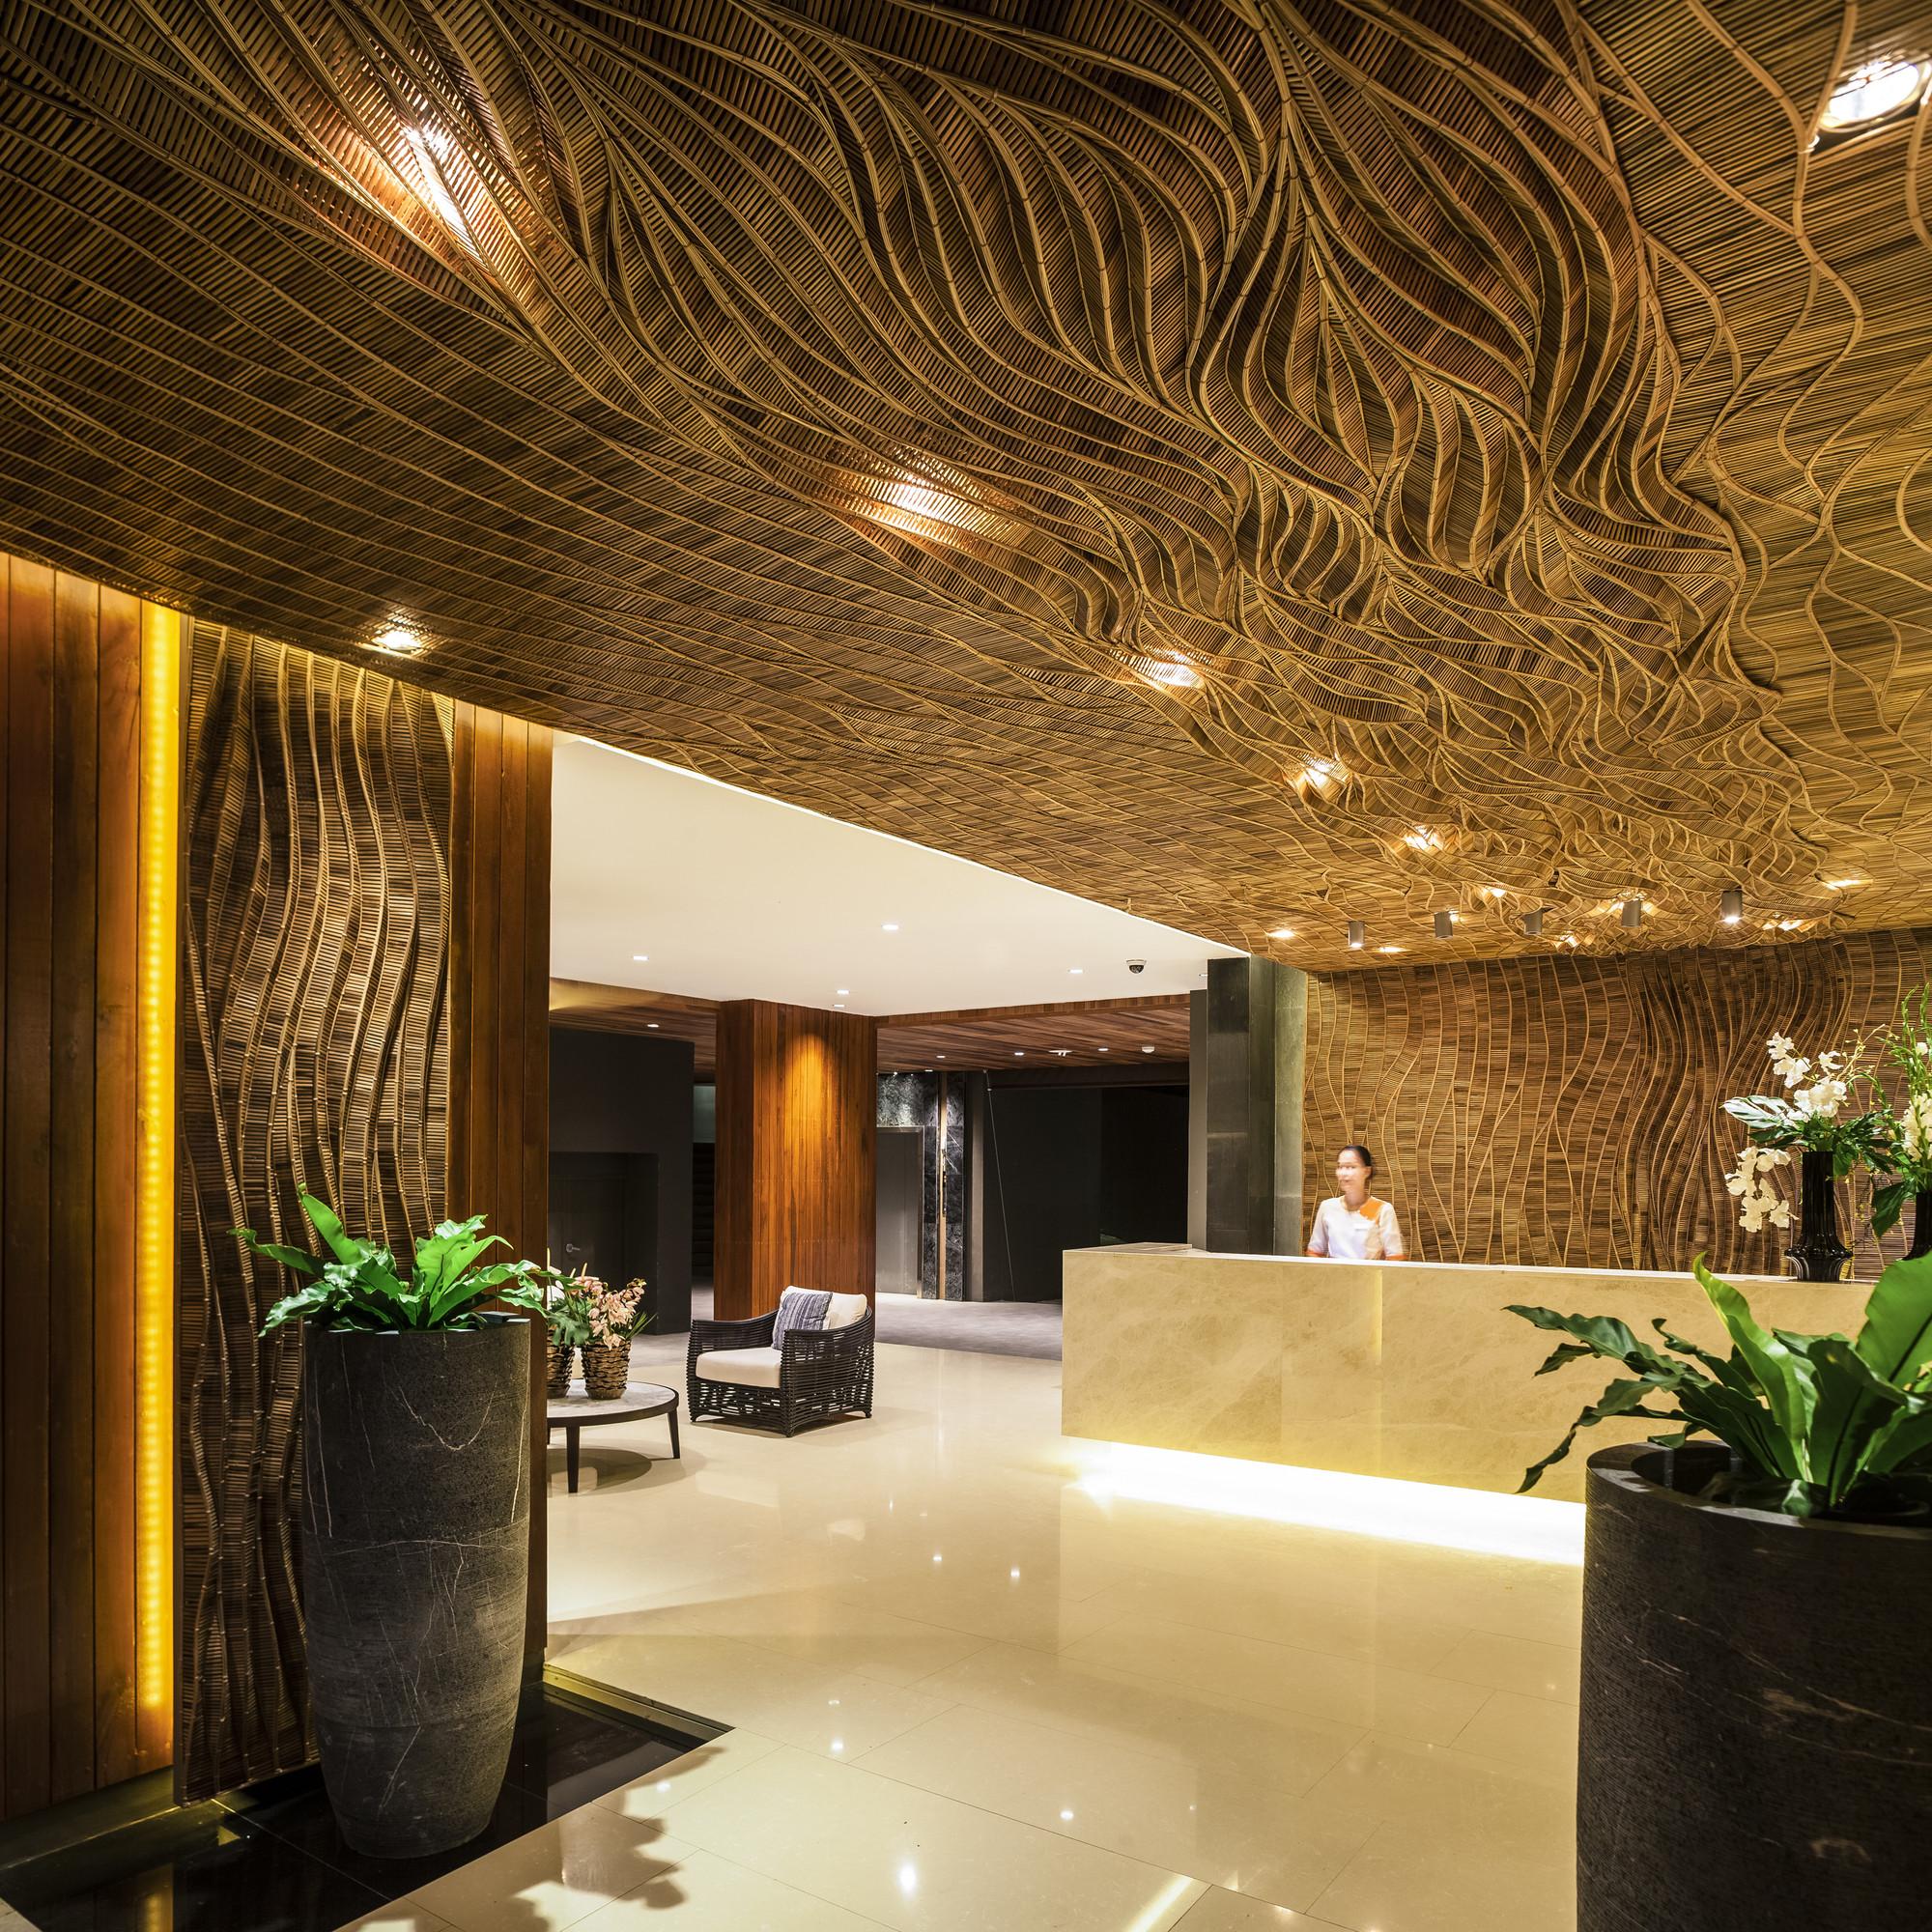 Gallery of kc grande resort spa hillside foundry of for Hotel spa decor